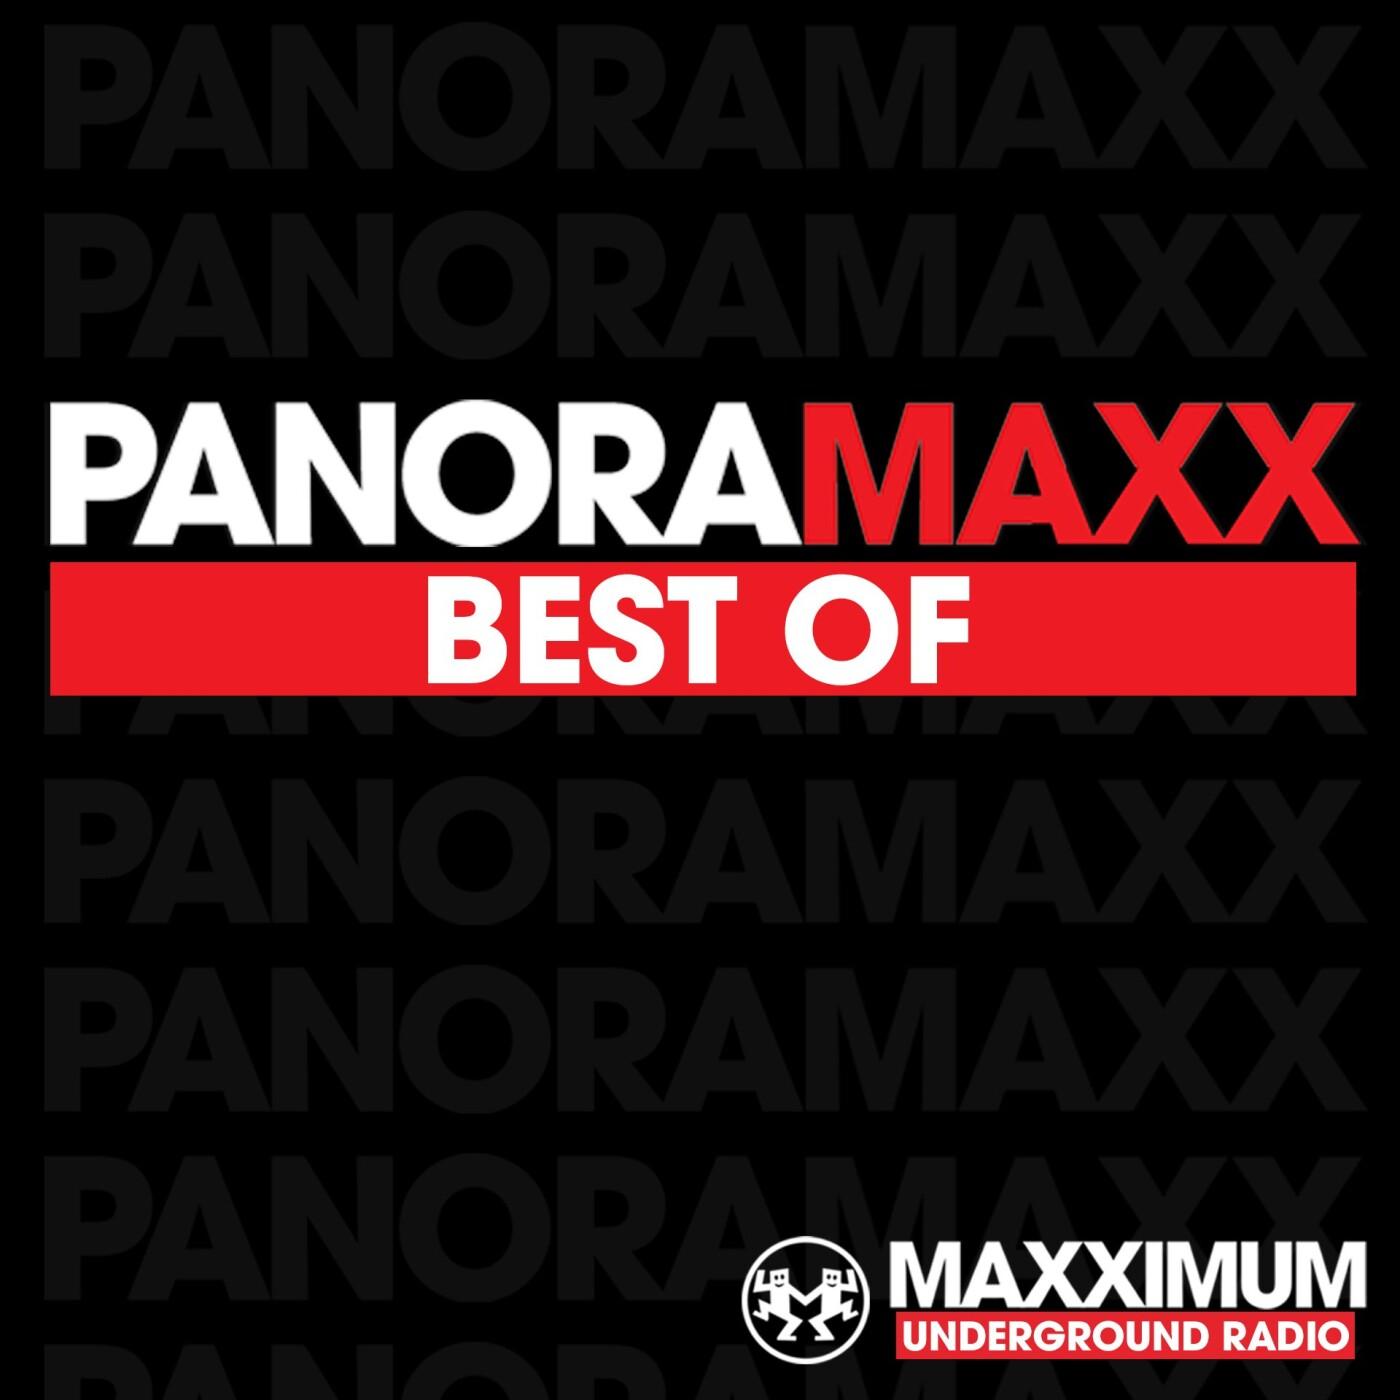 PANORAMAXX BEST OF : FREDERIC DJAALEB